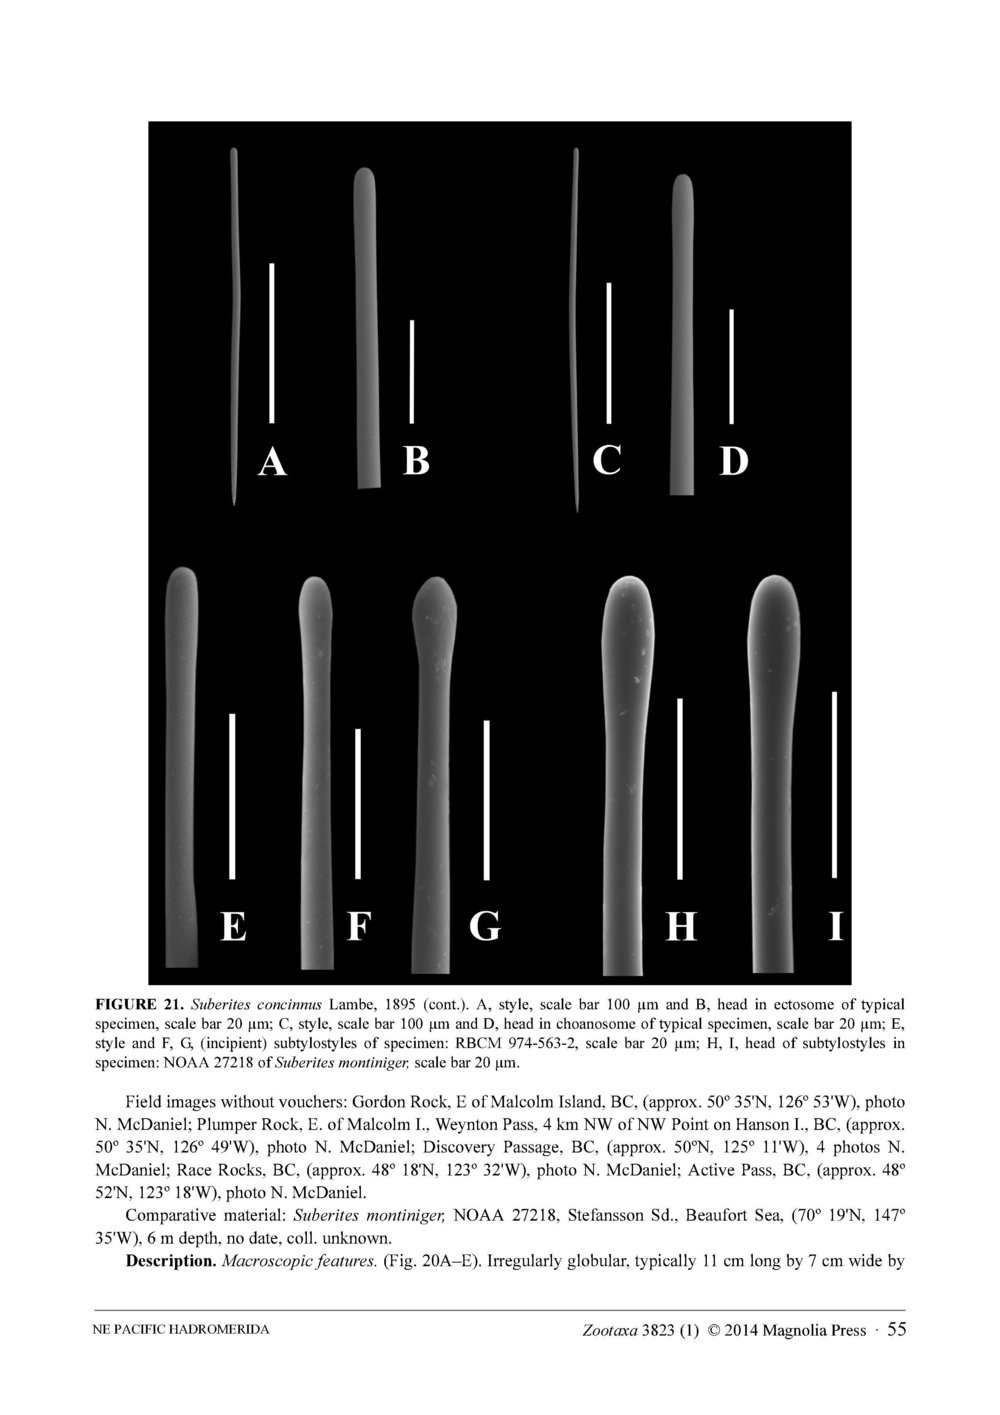 Austin et al 2014 NE Pacific Hadromerids_Page_55.jpg